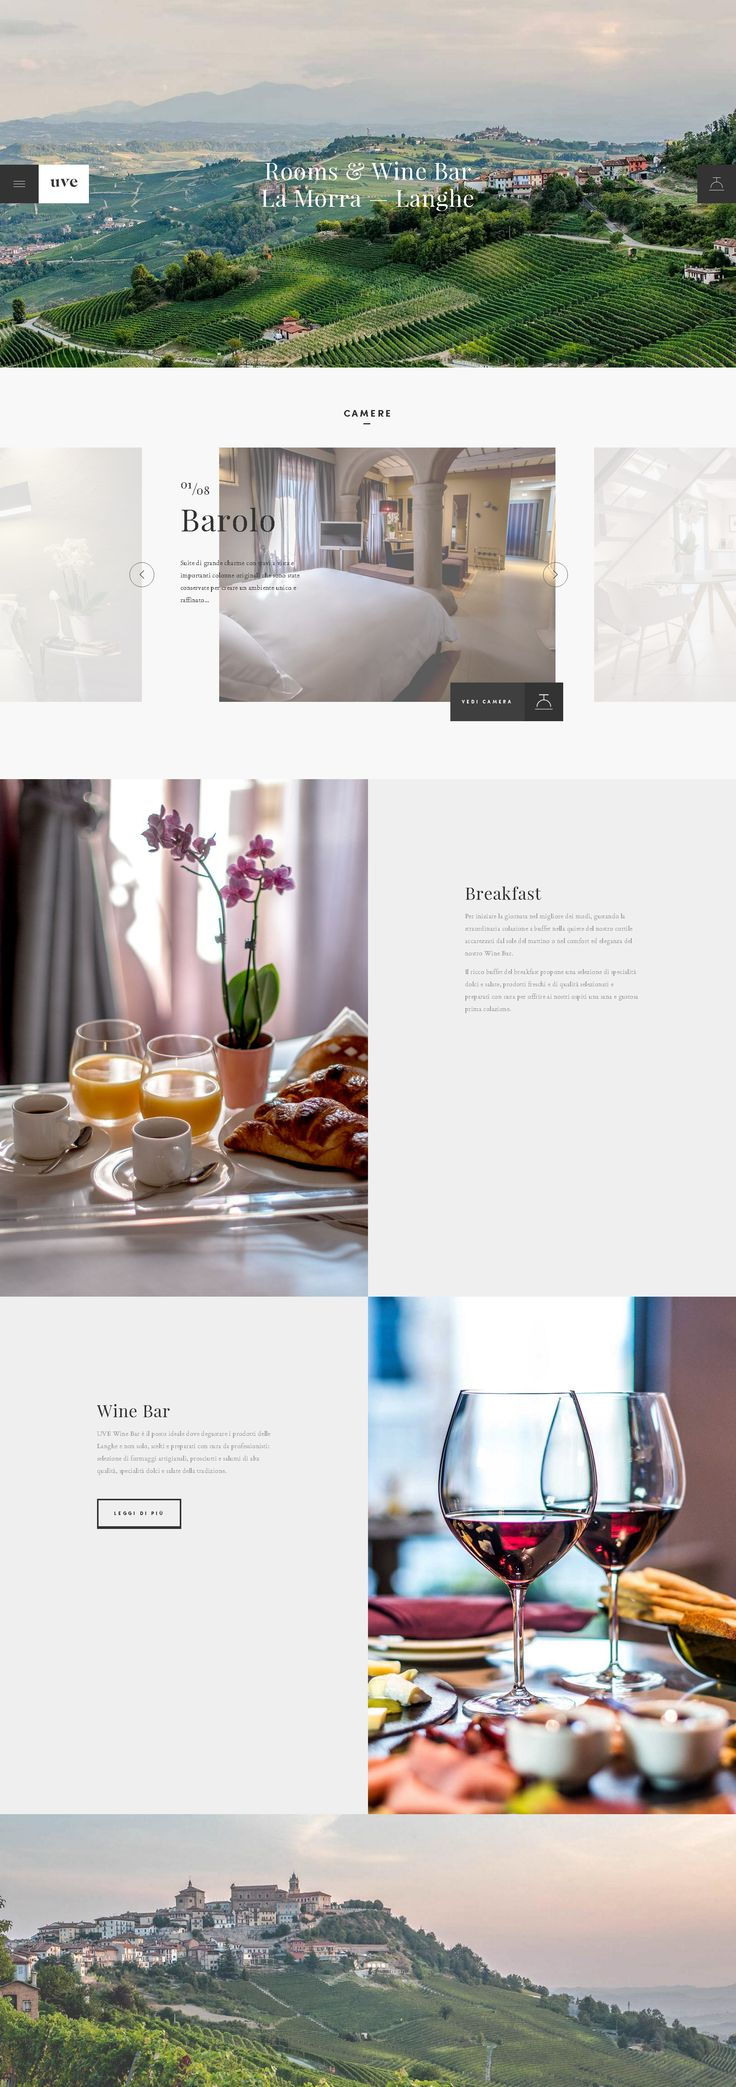 UVE Rooms & Wine bar #AQuest #WebDesign #Website